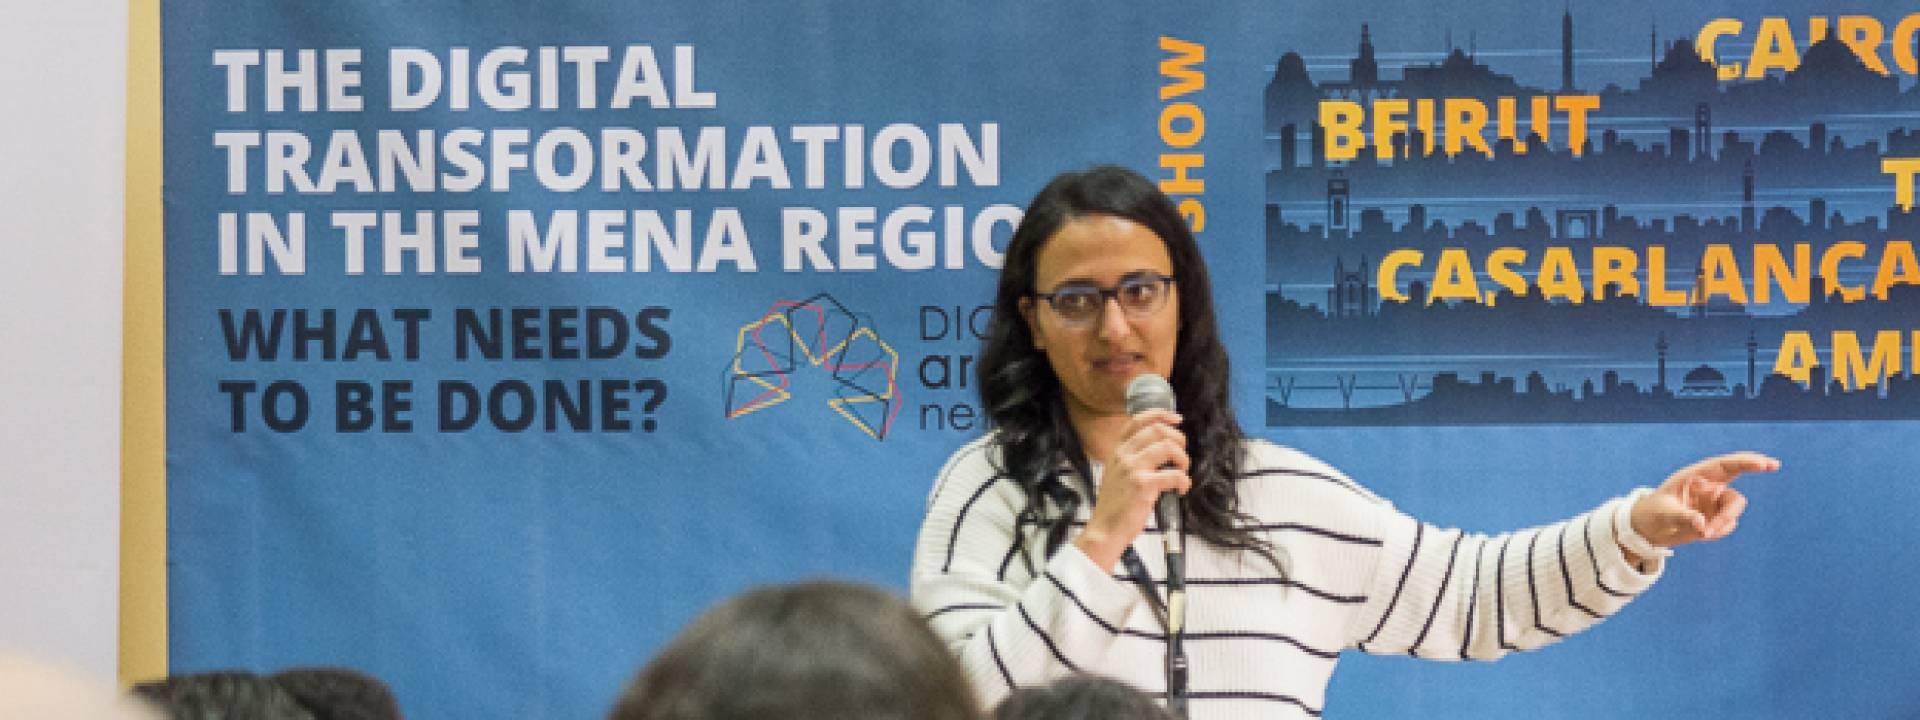 Digital Arabia Network